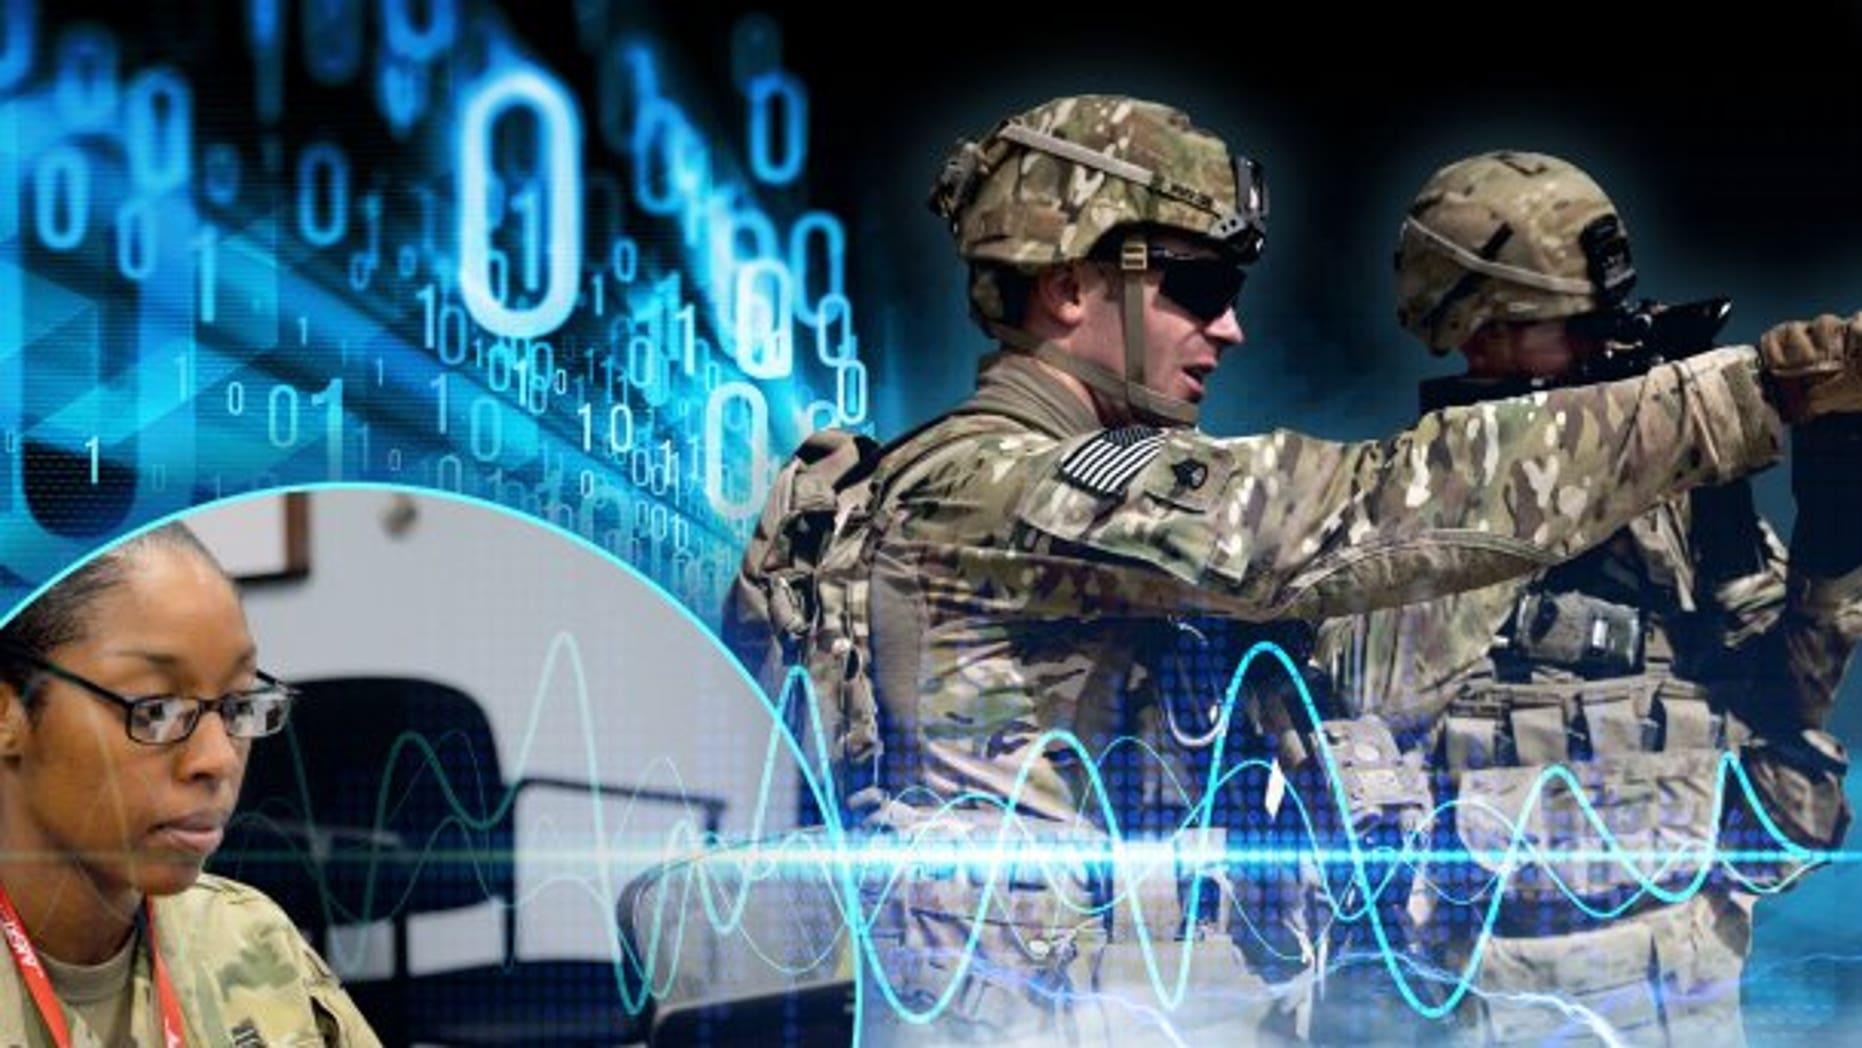 Army electronic warfare photo illustration. (Photo Credit: U.S. Army photo illustration by Justin Rakowski)